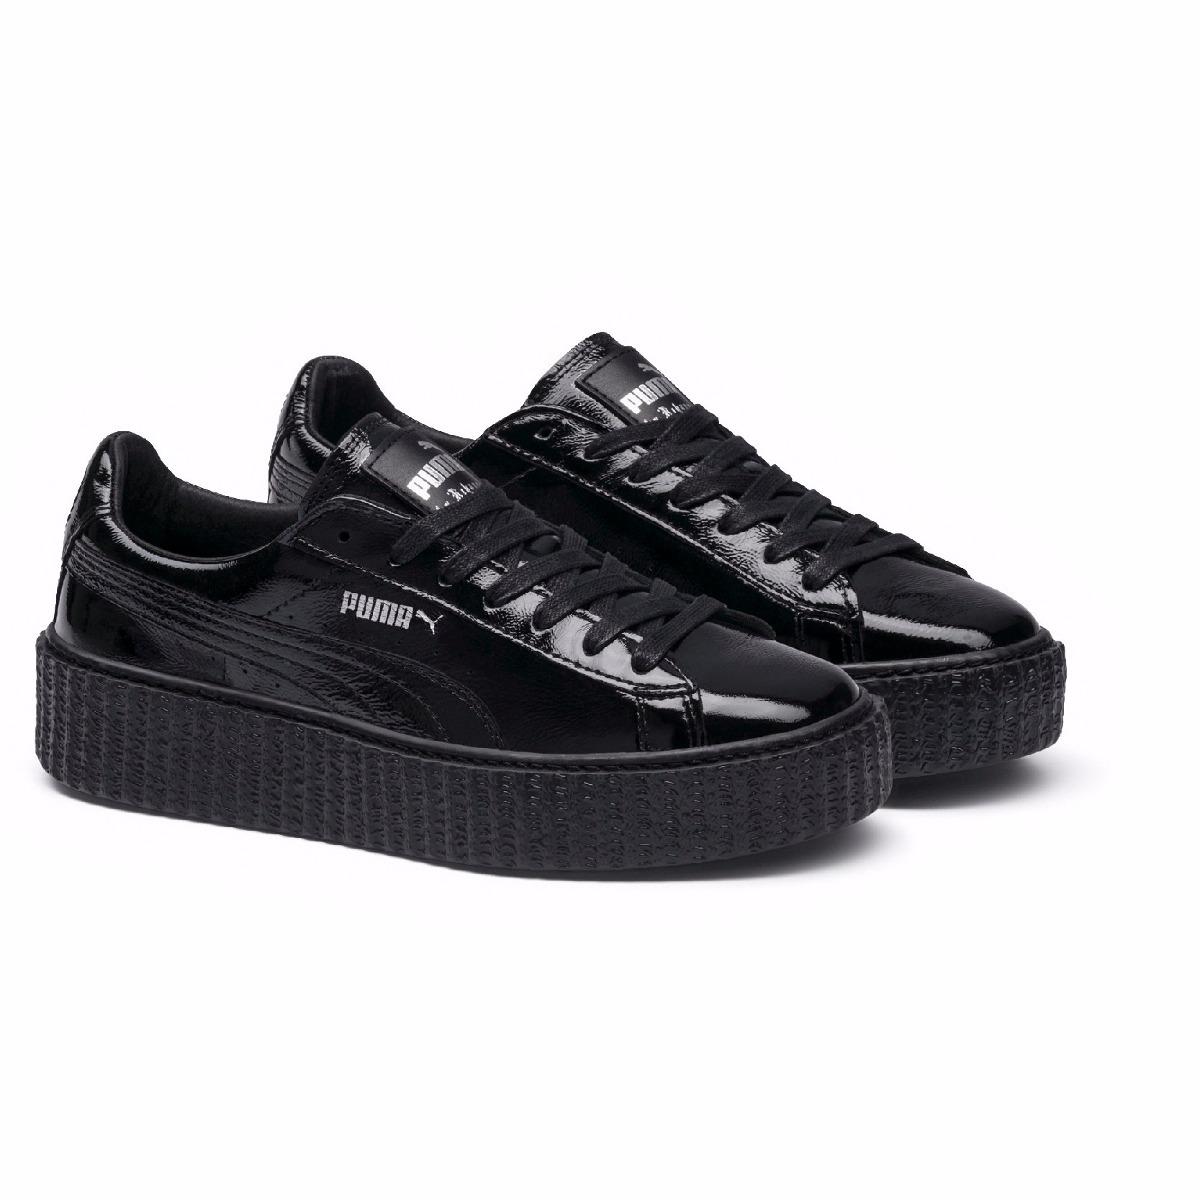 Rihanna Reebok Shoes